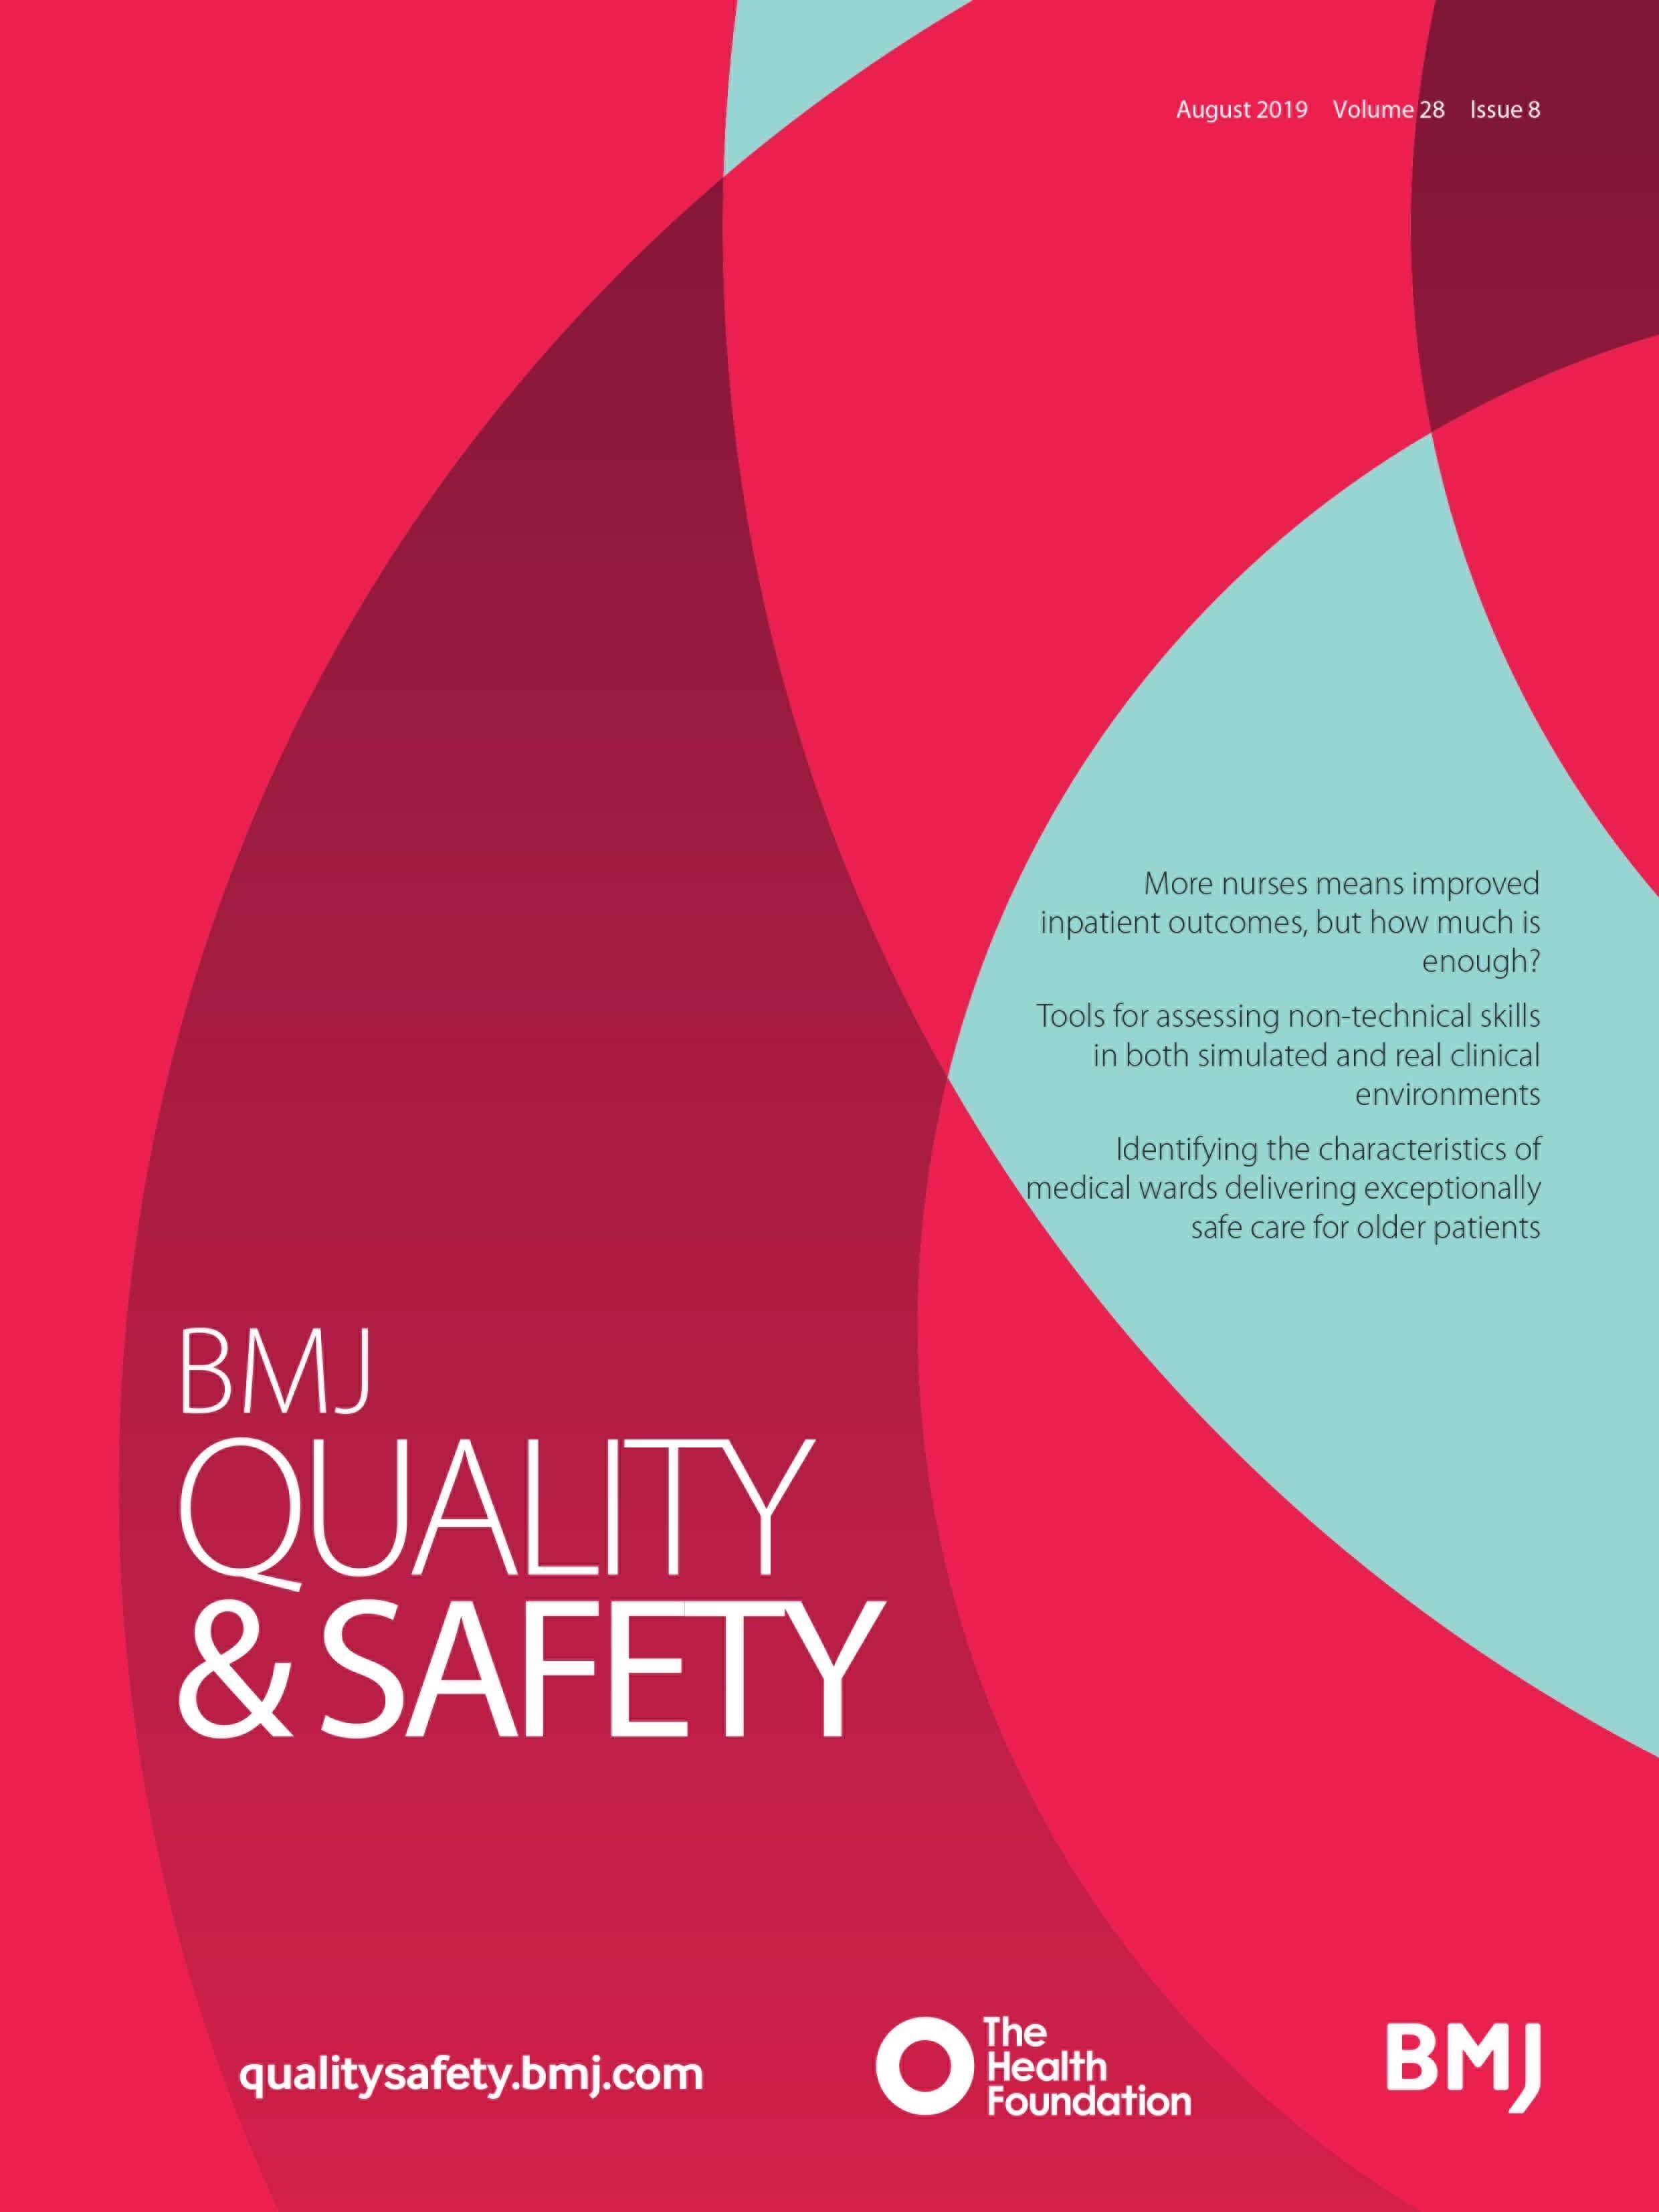 Nurse staffing, nursing assistants and hospital mortality